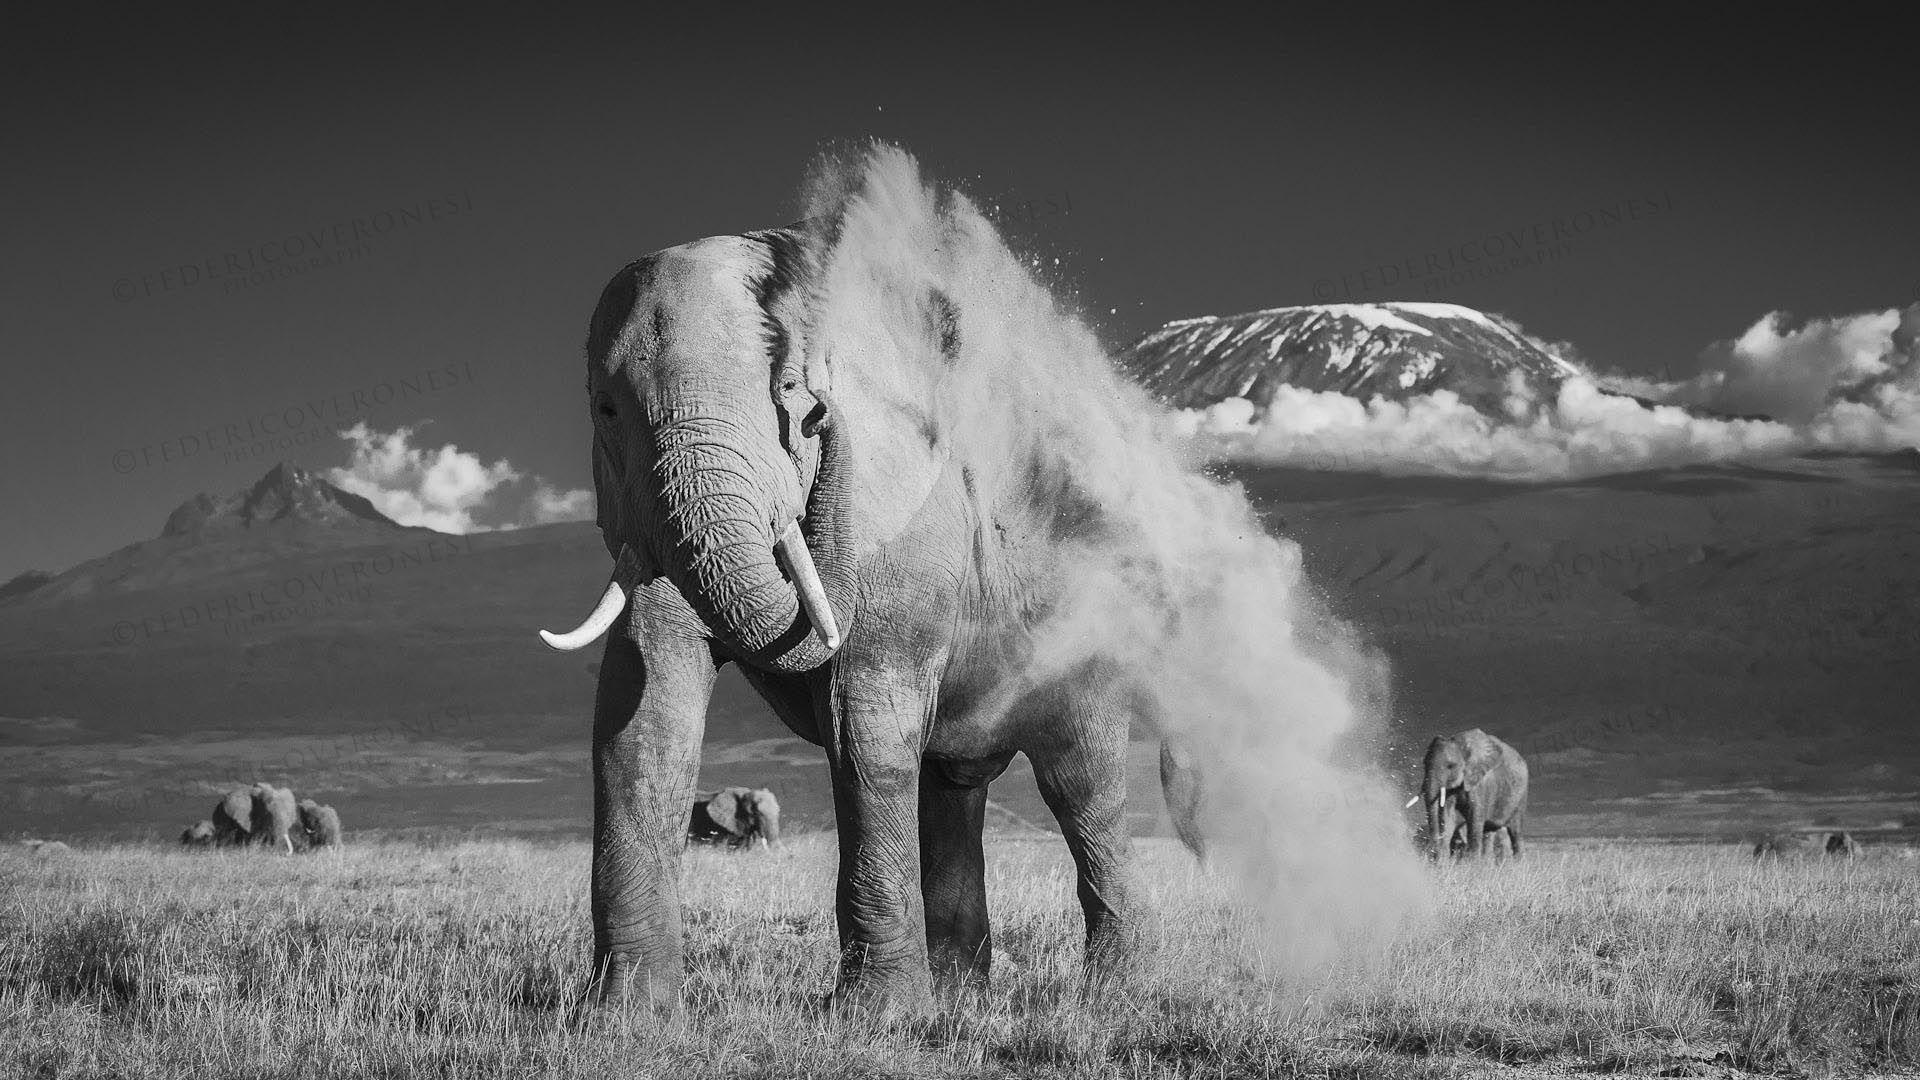 Pin By Antony Bermuda On Universo Animali Pachidermi Elephant Photography Elephant Black And White Elephant